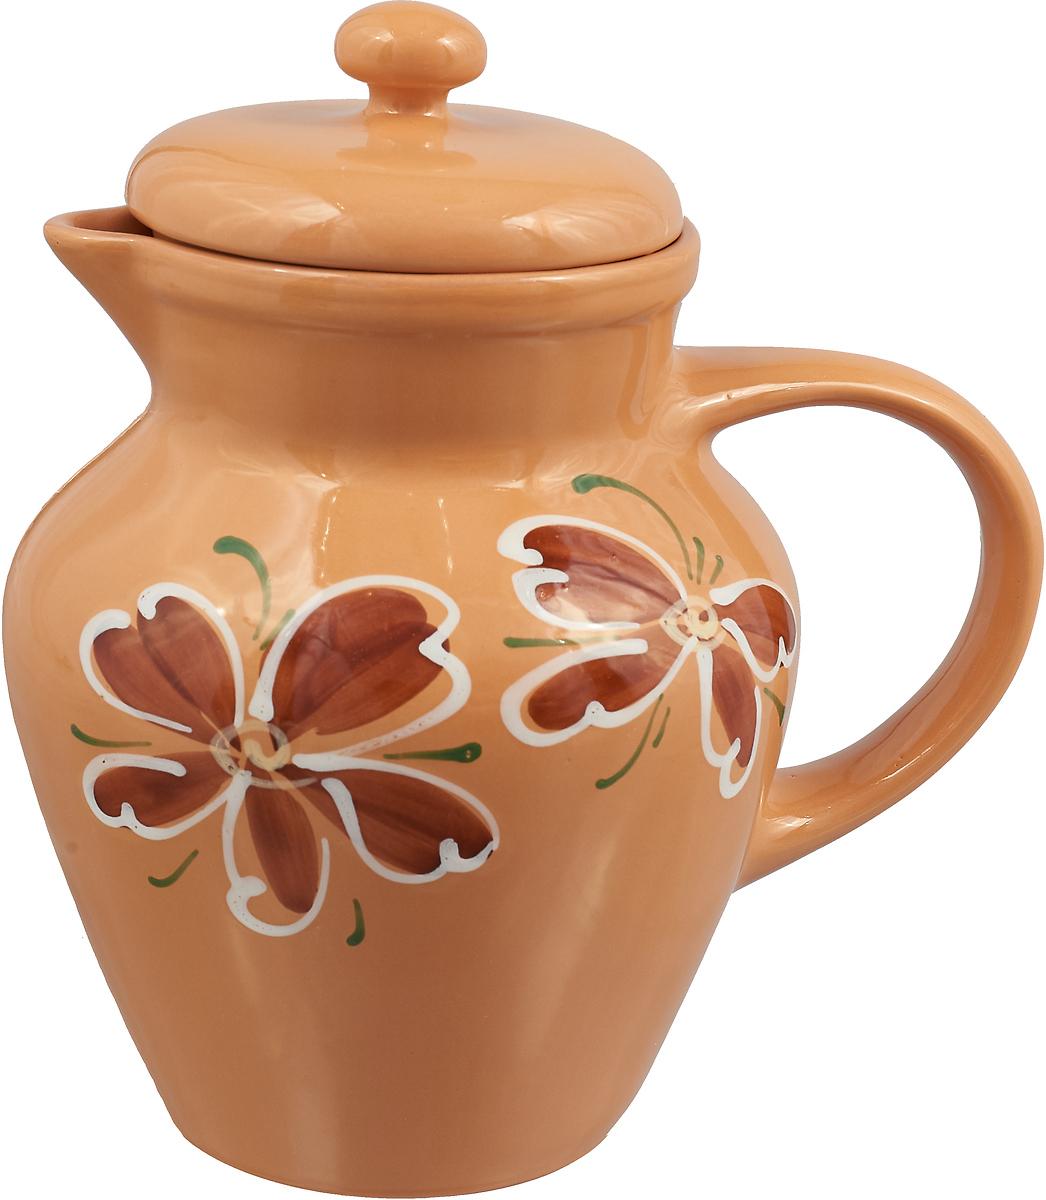 Кувшин Борисовская керамика Стандарт, с крышкой, цвет: бежевый, 1,7 л кувшин букингем 1л керамика